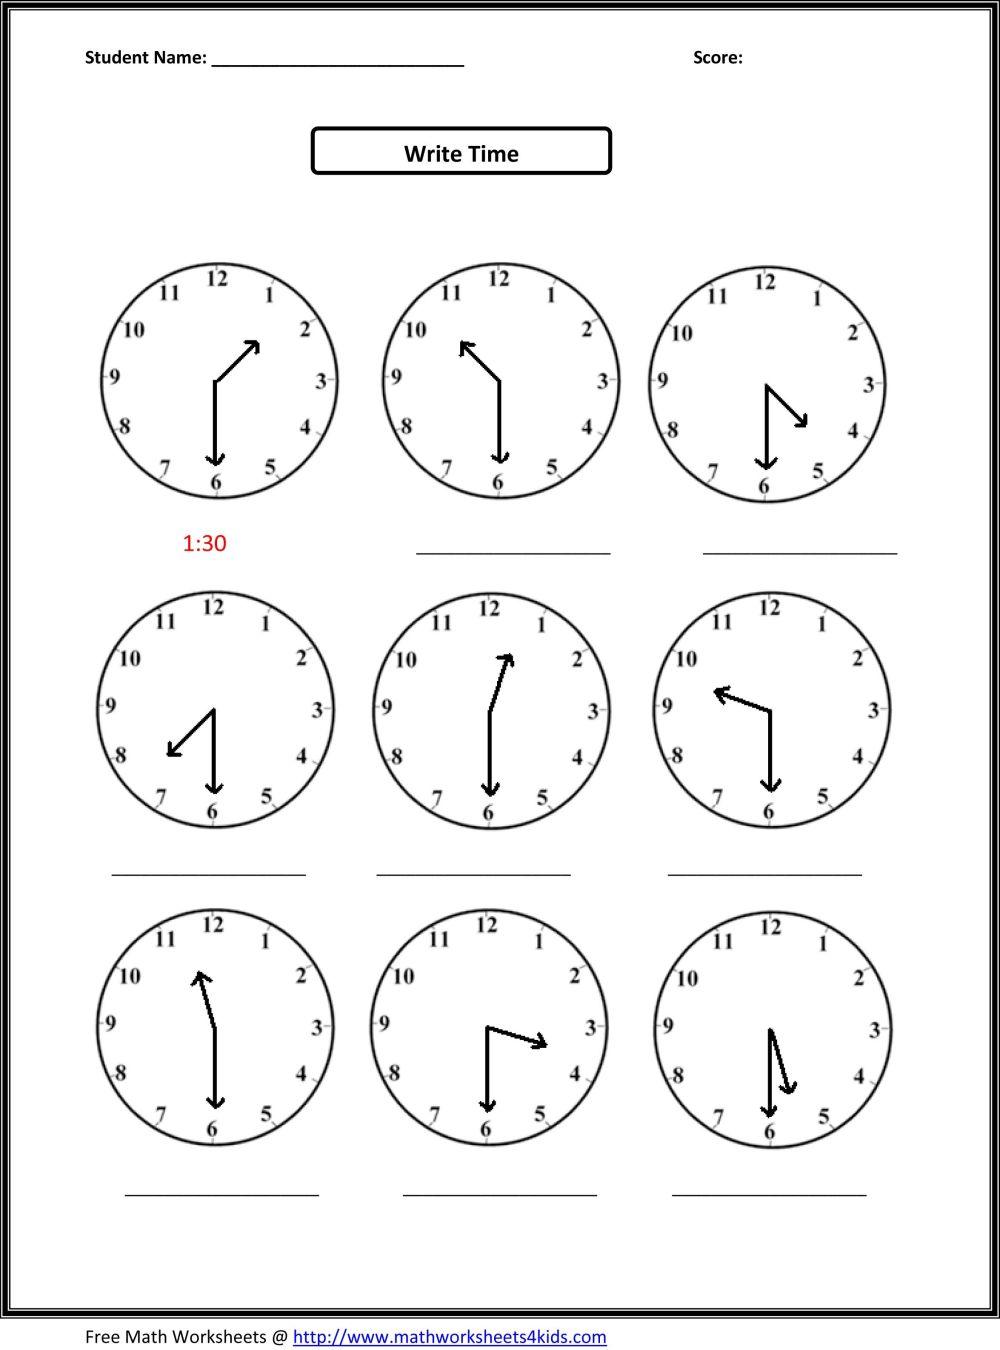 medium resolution of 2nd Grade Free Worksheets Math   Matematik T3   2nd Grade Math on Best  Worksheets Collection 4989